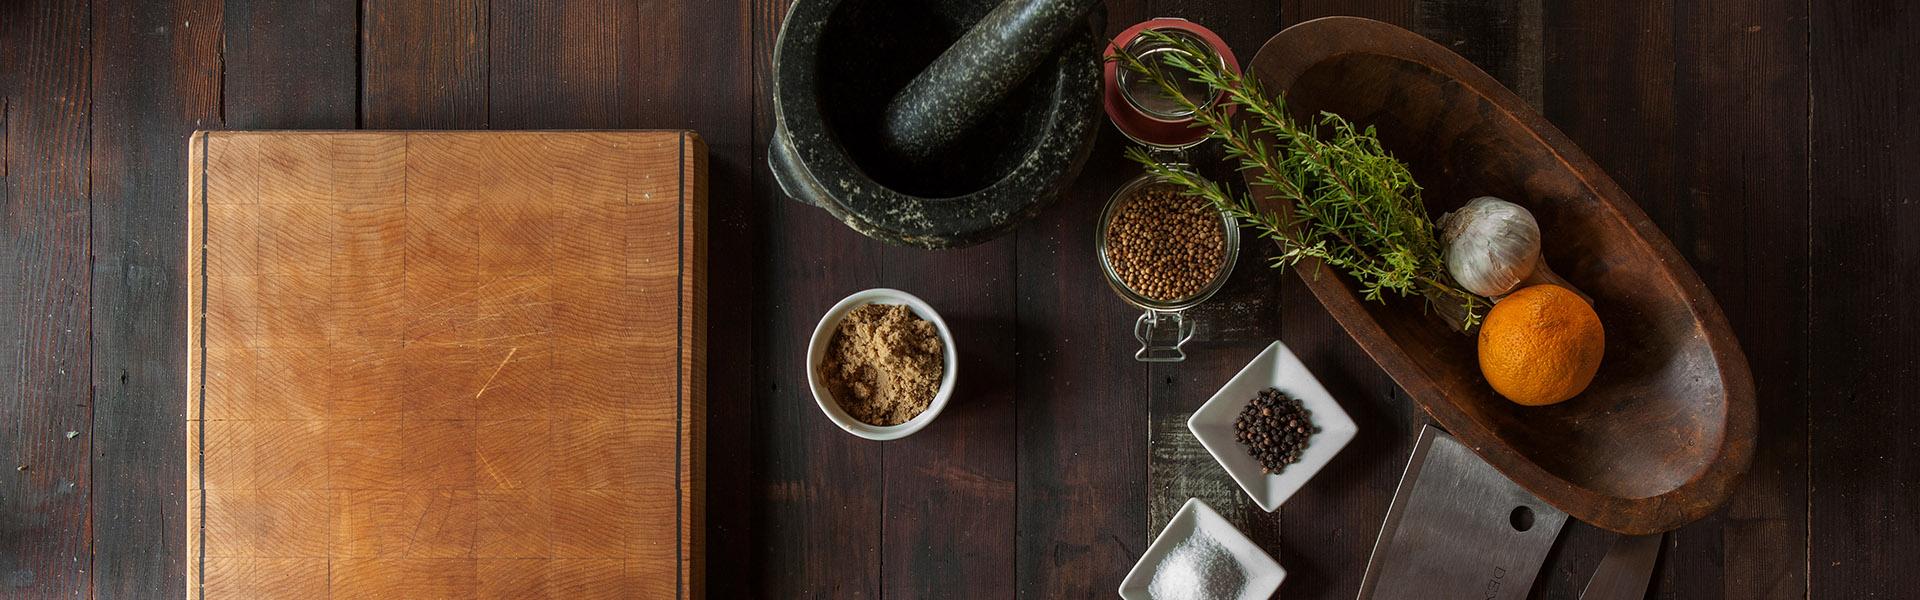 OerFitAltena-voedingsadvies